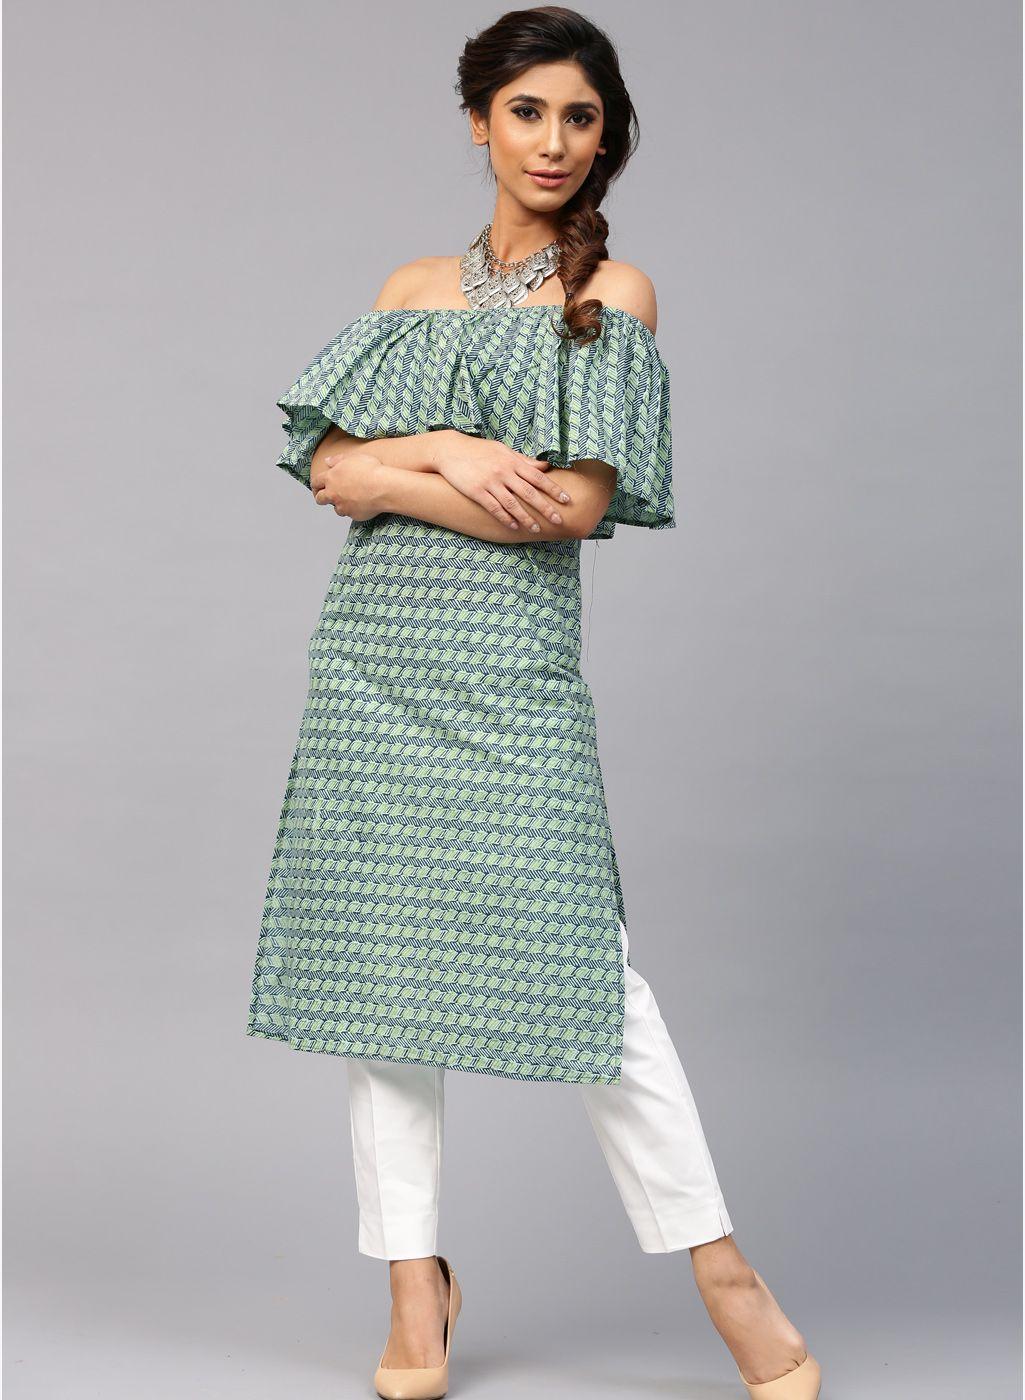 98f0f413ca1 Aks Green Cotton Printed Off Shoulder Kurta  Green  Cotton  Printed   OffShoulder  Kurta  Summer  Kurtis  Casual